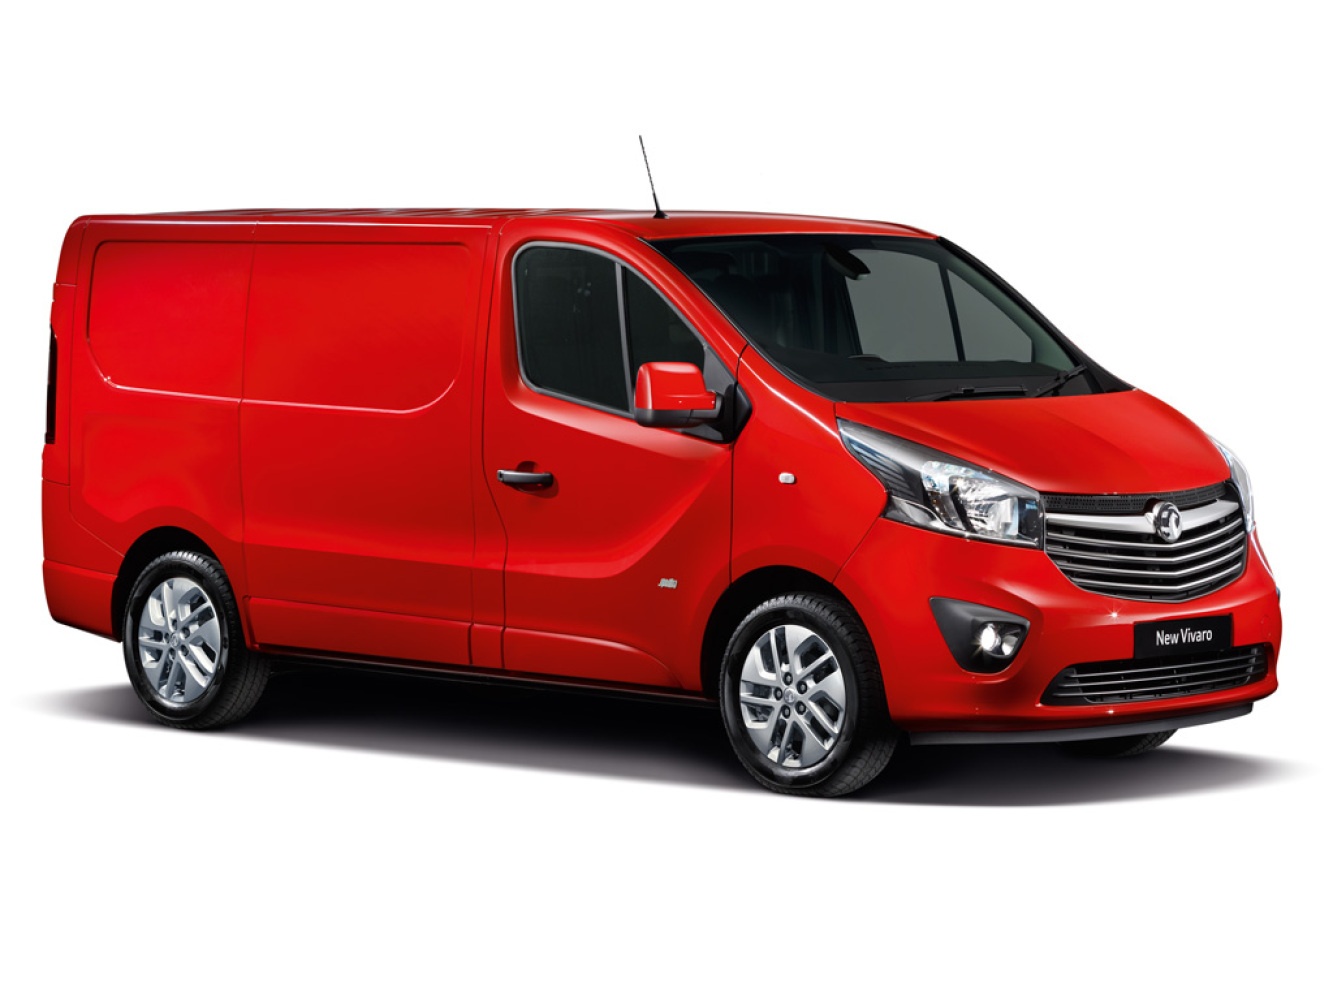 eaa5038f6ba1fa New Vauxhall Vivaro Swb Diesel 2900 1.6Cdti 115Ps Sportive H1 Van ...